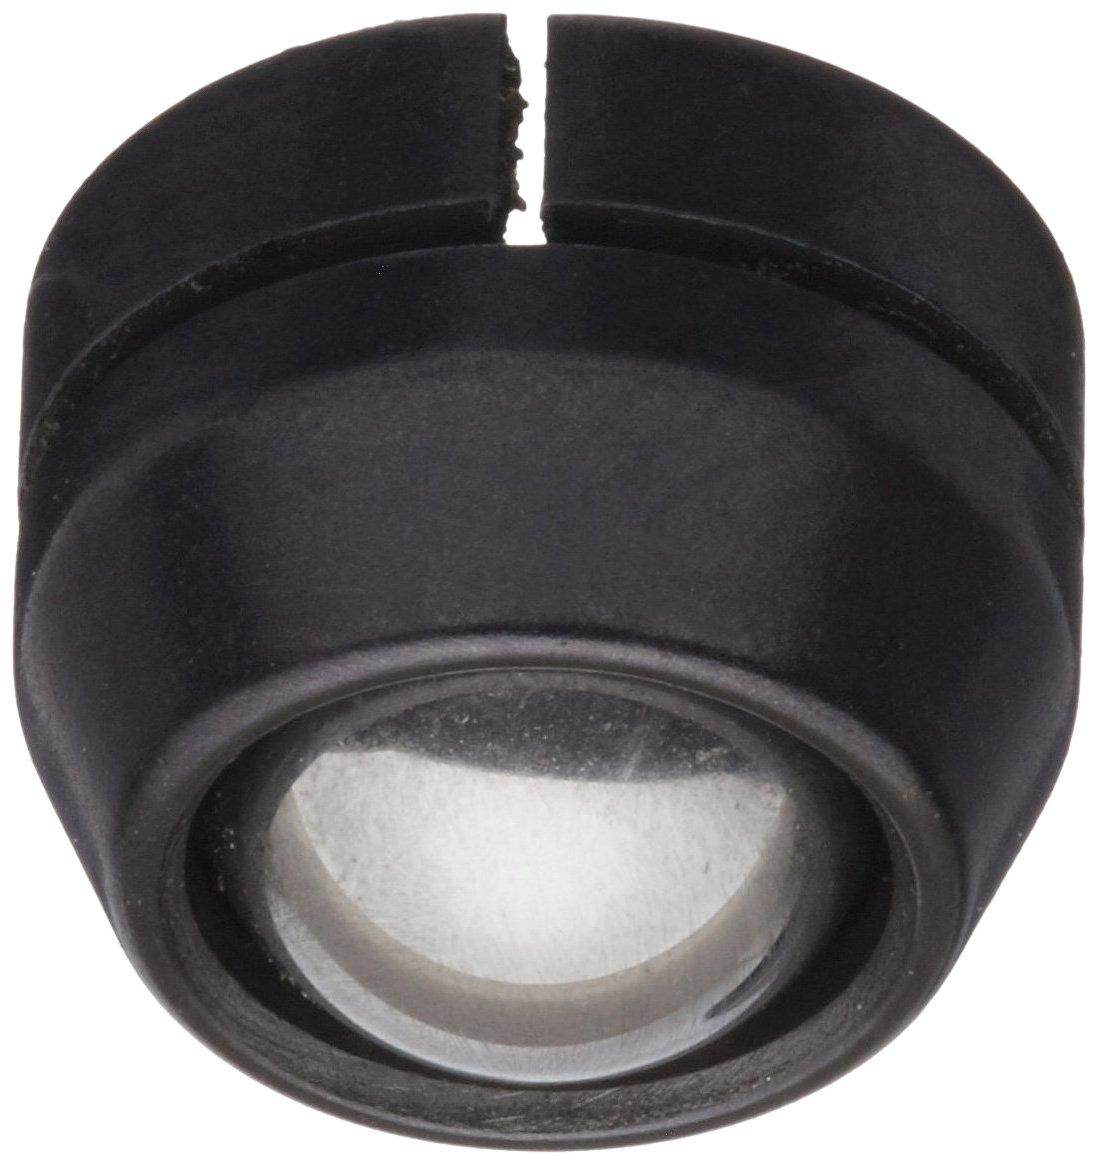 Starrett 247B Micrometer Ball Attachments, 0.200' Ball Diameter, .270' Diameter Anvil and Spindle, Inch 0.200 Ball Diameter .270 Diameter Anvil and Spindle